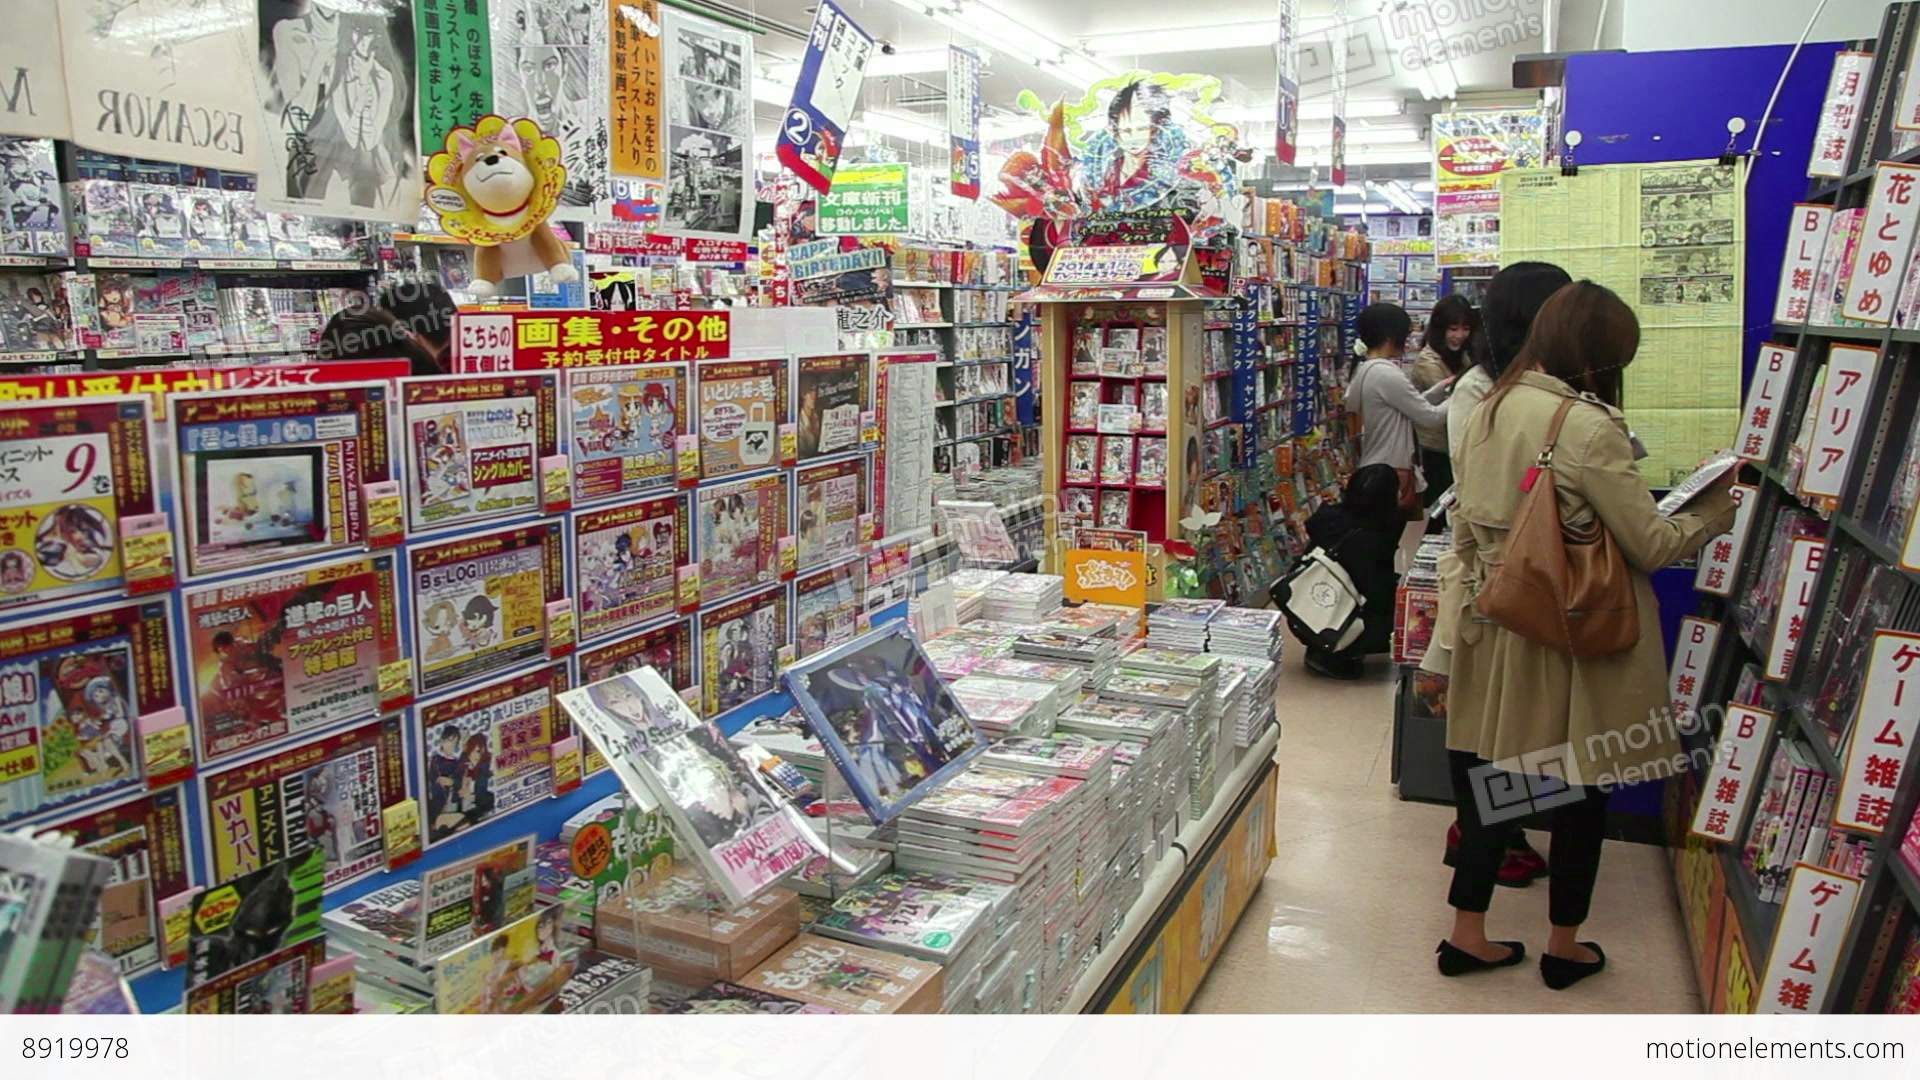 1of 10 shop store comics manga books magazines kyoto japan asia stock video. Black Bedroom Furniture Sets. Home Design Ideas